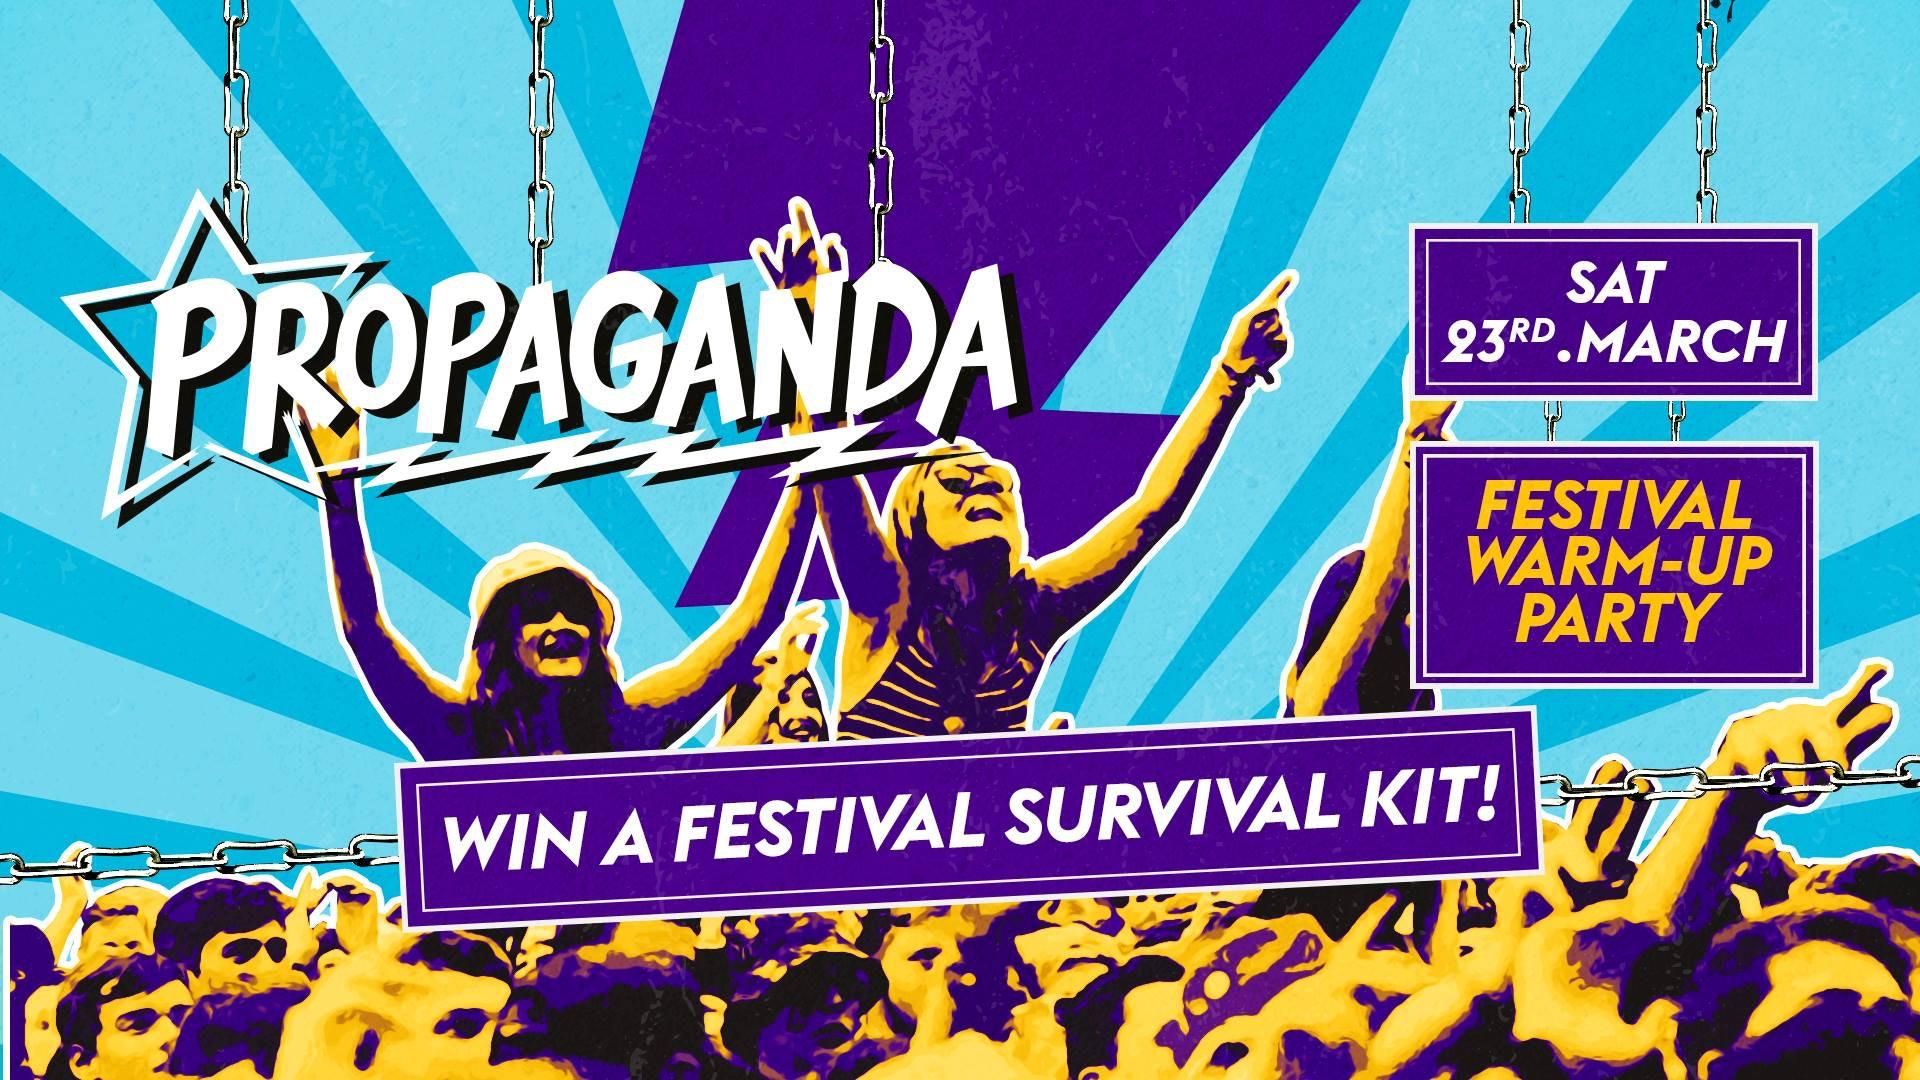 Propaganda London – Festival Warm-Up Party!